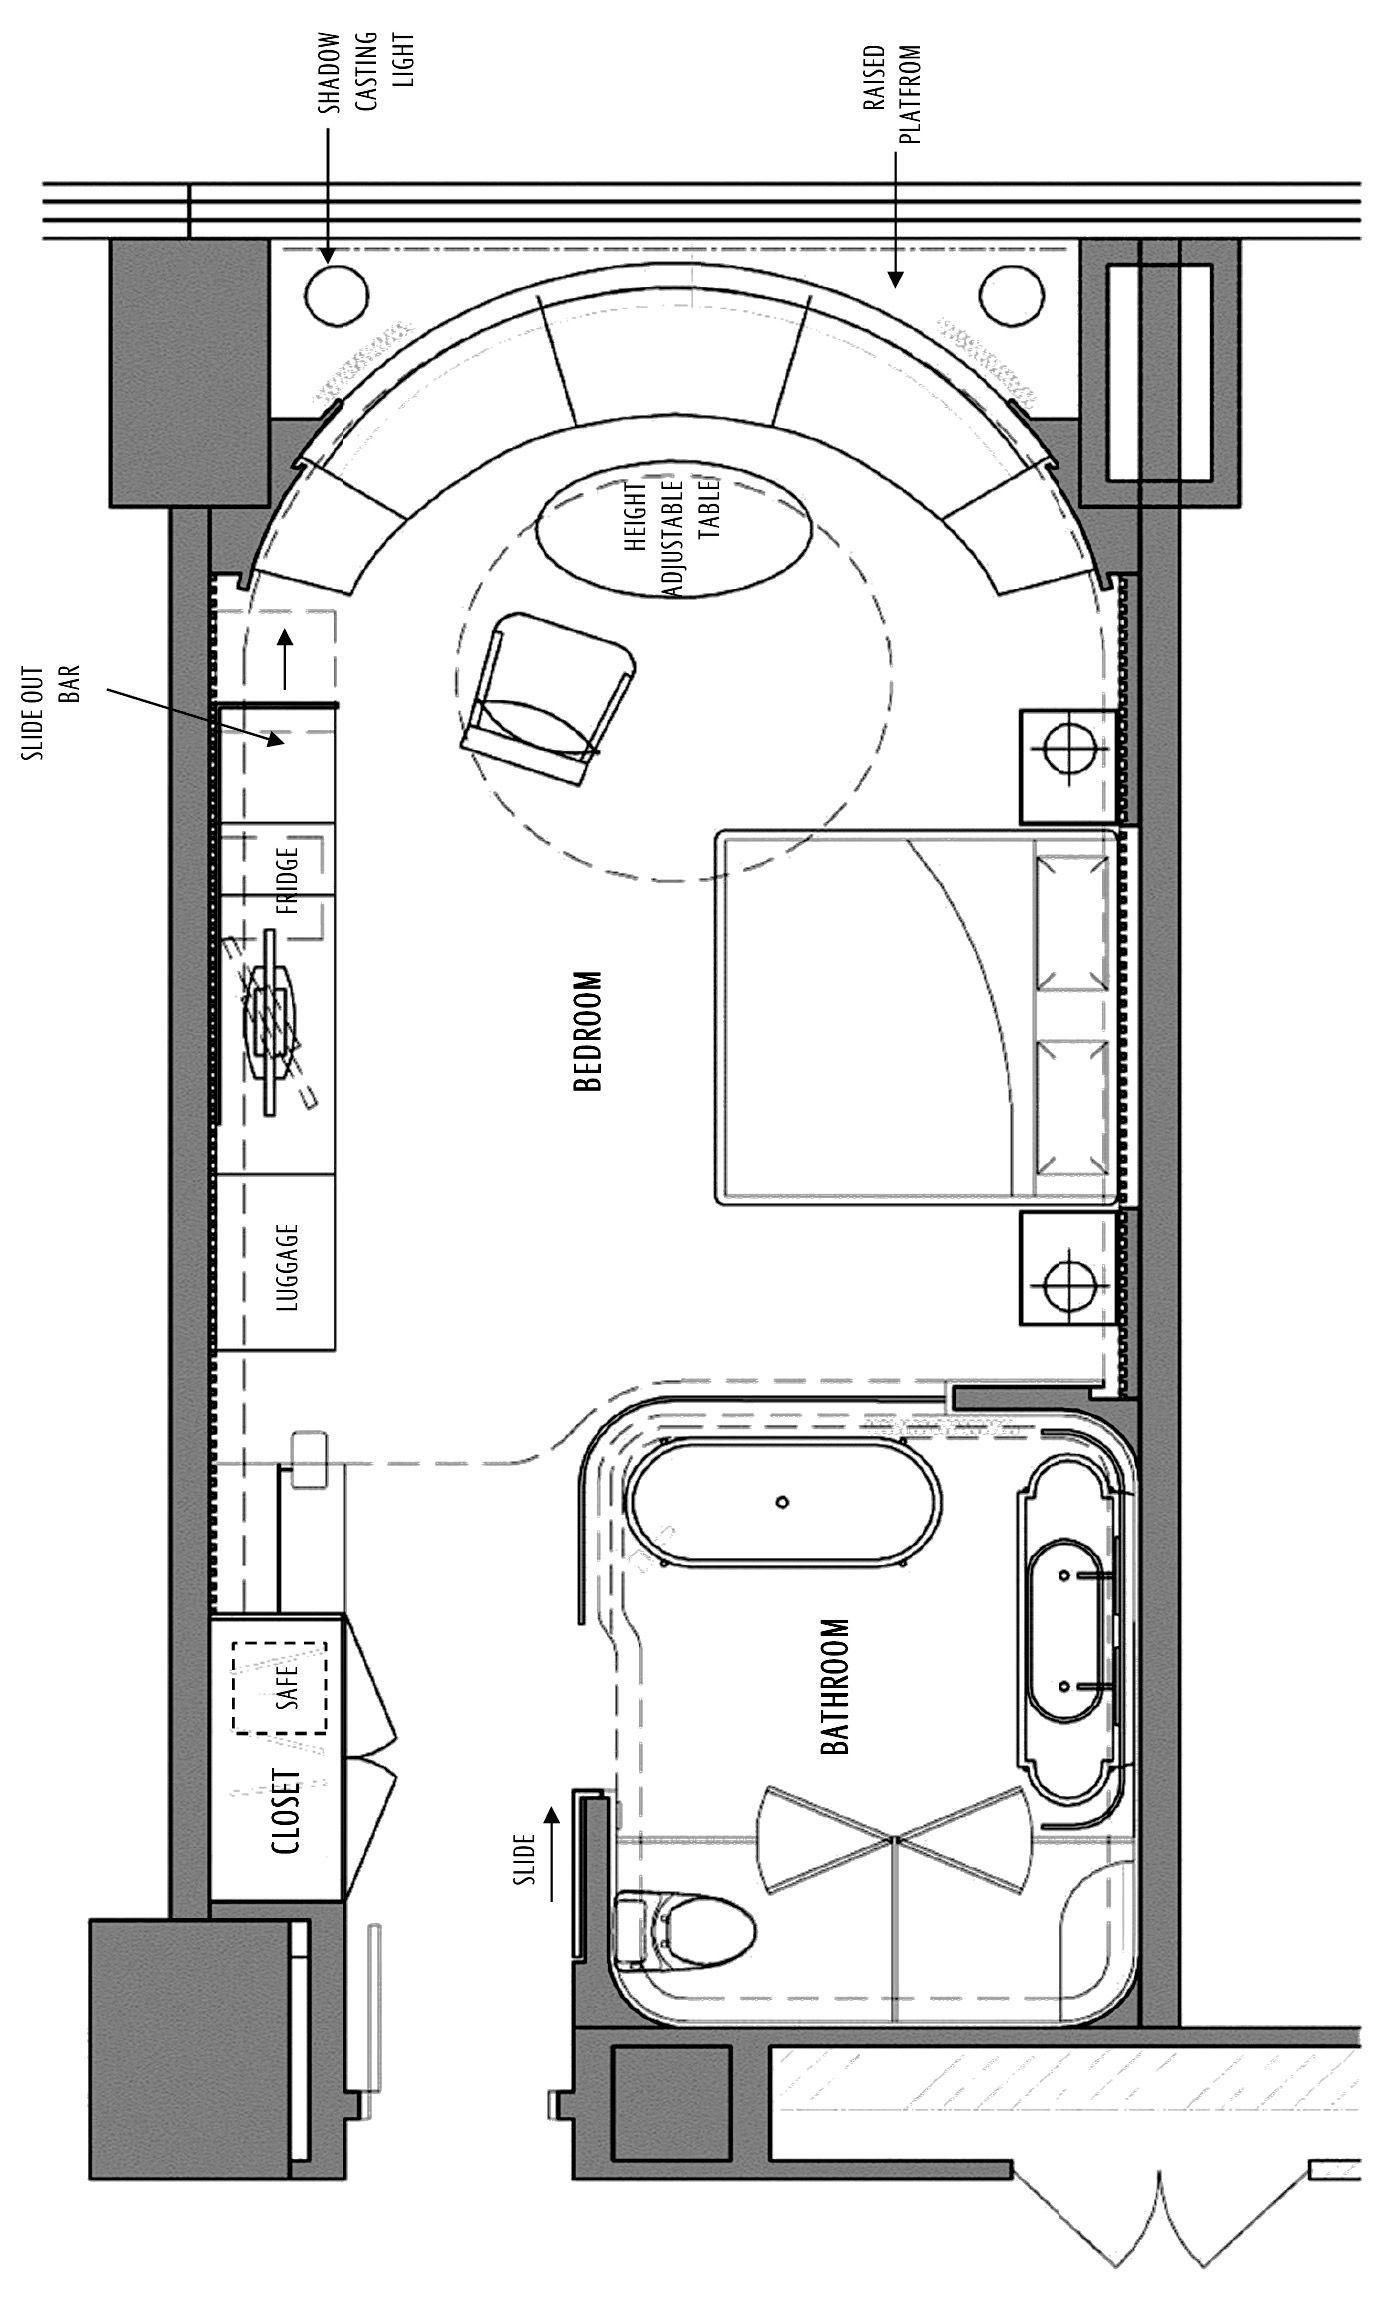 Hotel Guest Room Design: Hotel Room Design Plan, Hotel Plan